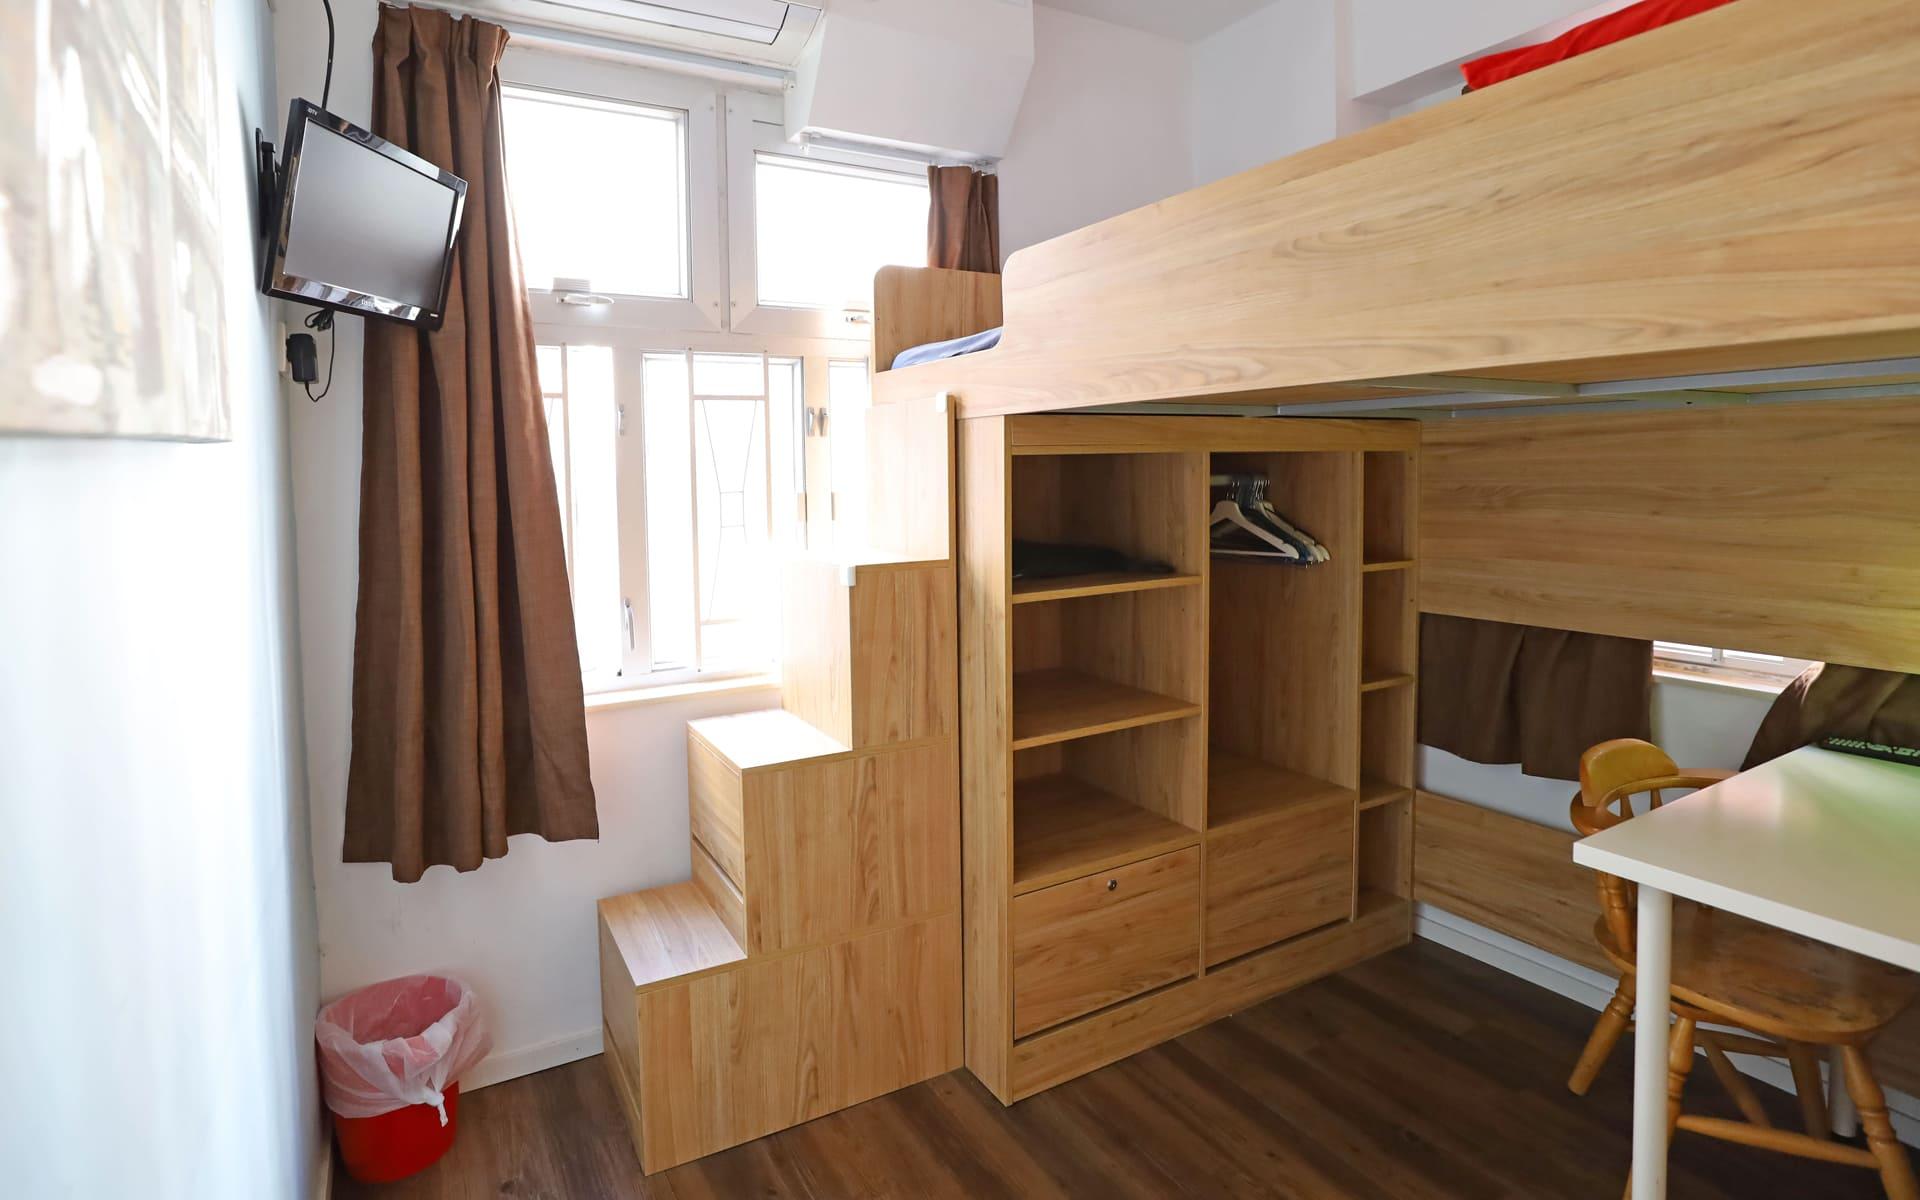 hk_service_apartment_1182206951596886710.jpg